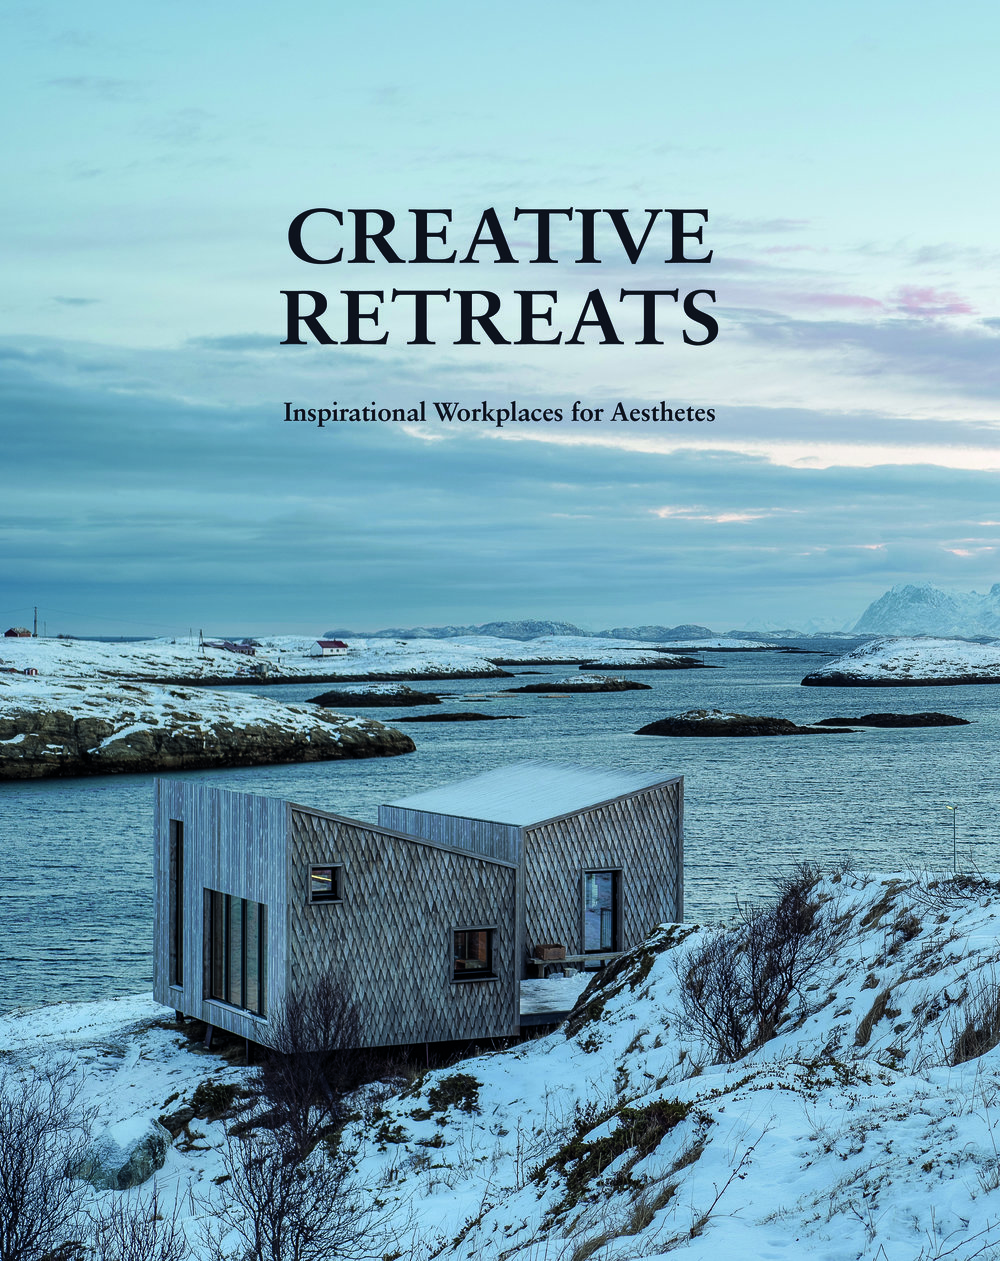 Creative retreats front cover.jpg